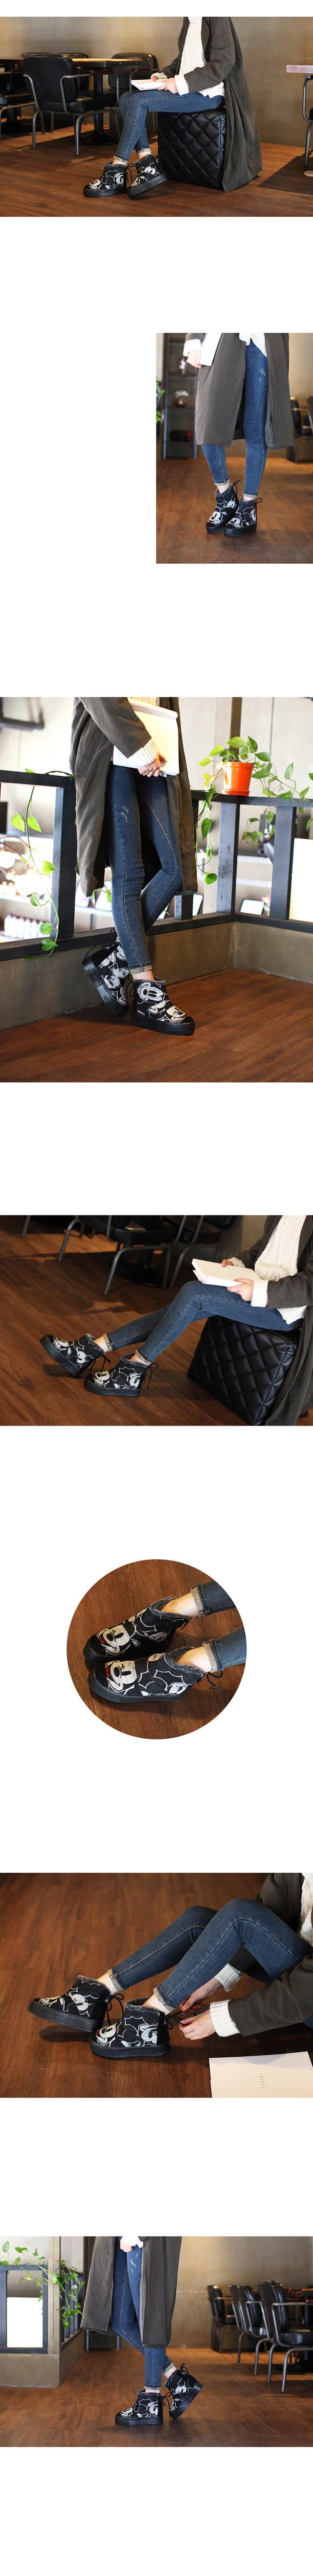 Elias Kipopi Fur Boots 5.5cm